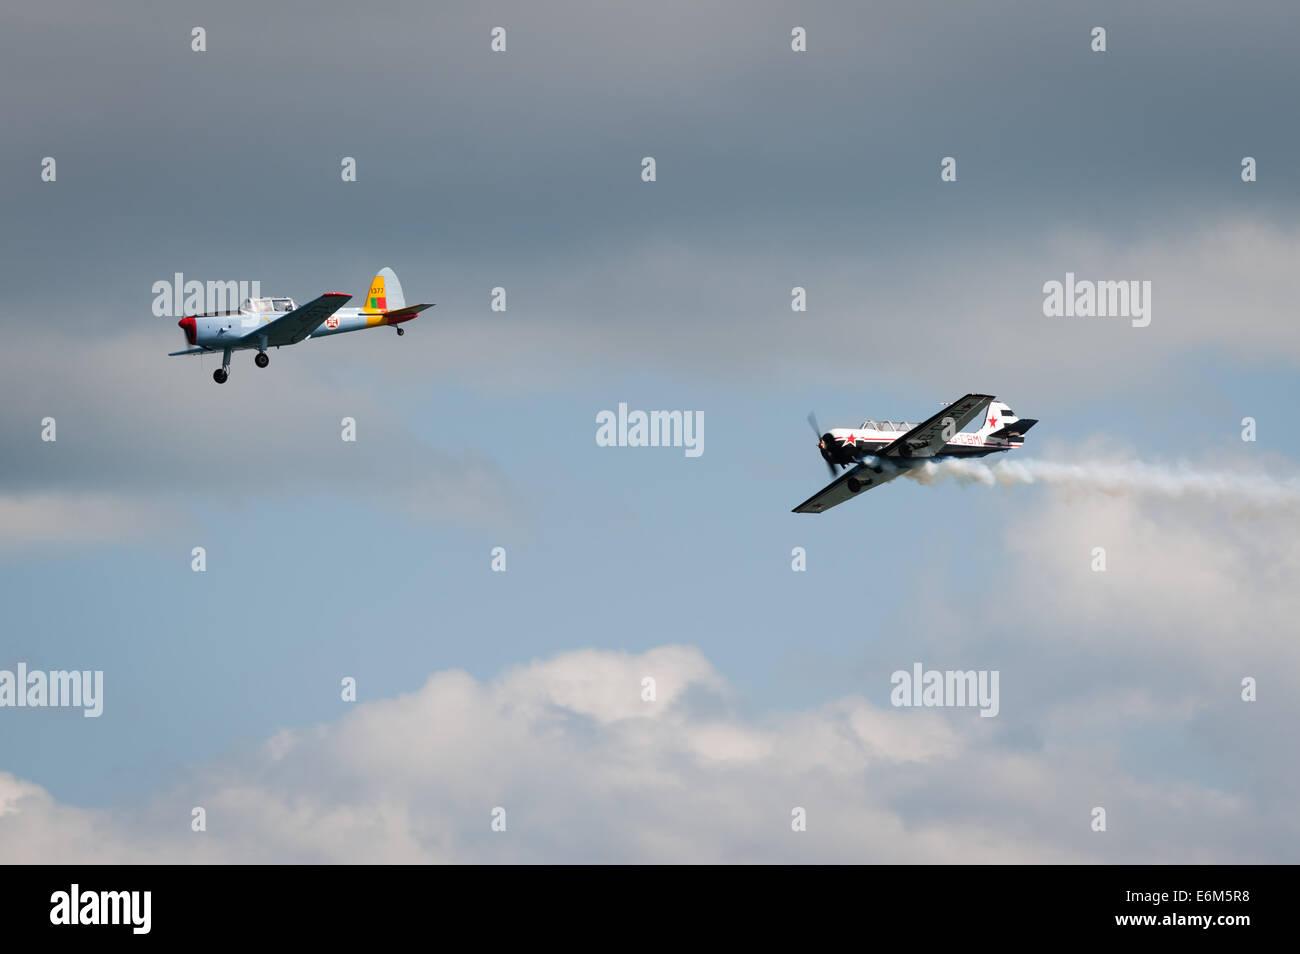 De Havilland Canada DHC-1 Chipmunk and T6 Texan, Dawlish Air Show Aug 23, 2014. - Stock Image